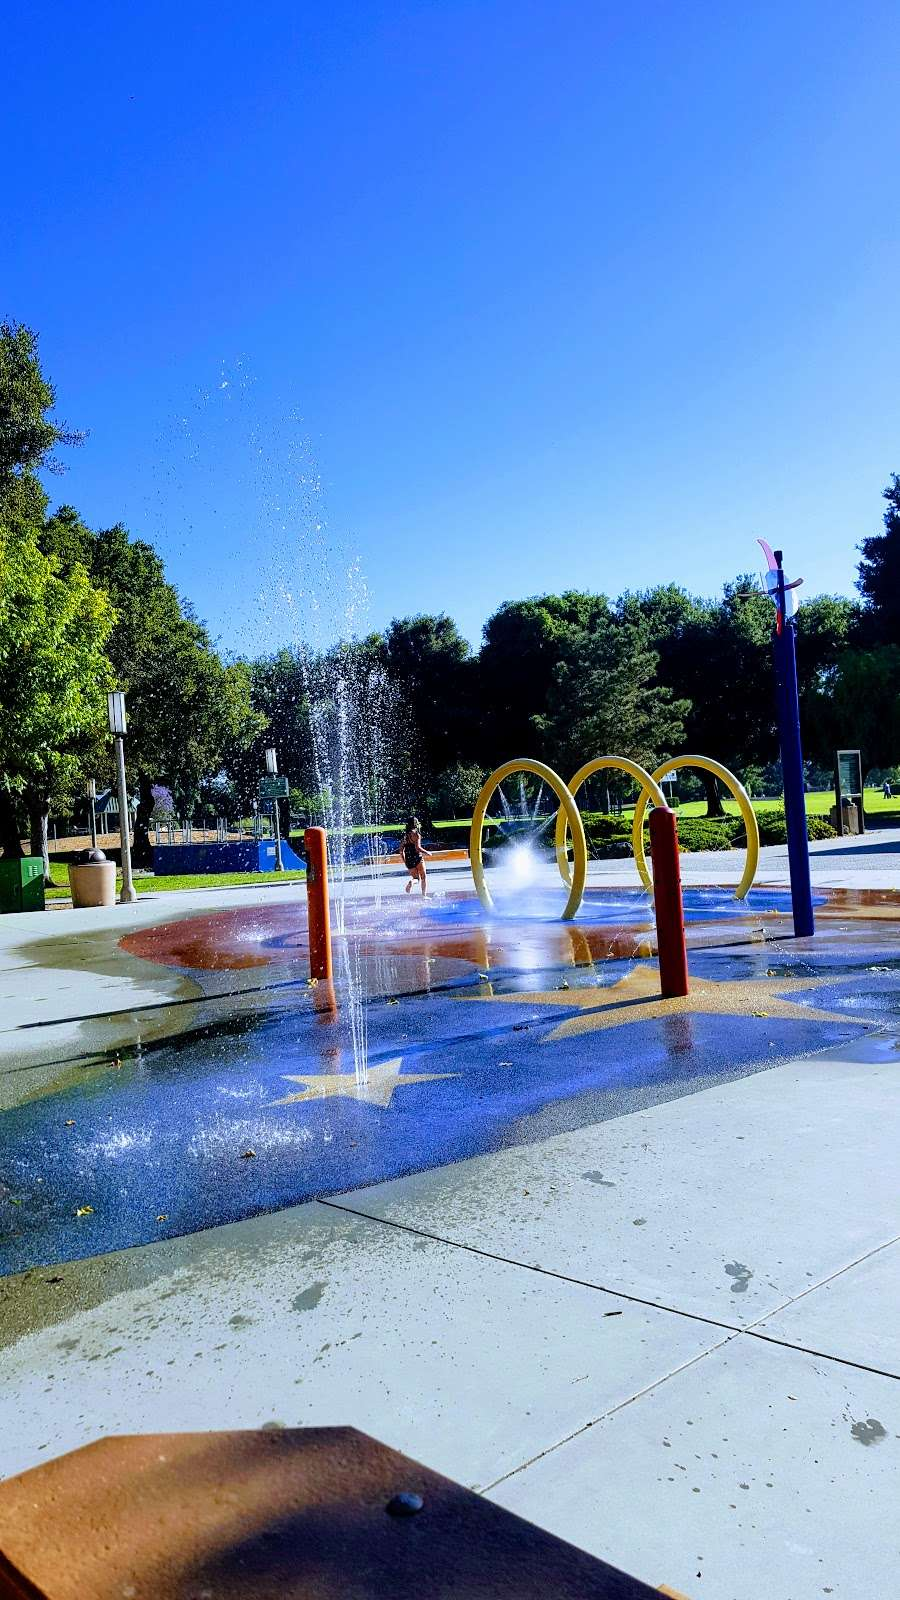 Lakewood Park - park  | Photo 4 of 10 | Address: 834 Lakechime Dr, Sunnyvale, CA 94089, USA | Phone: (408) 730-7350